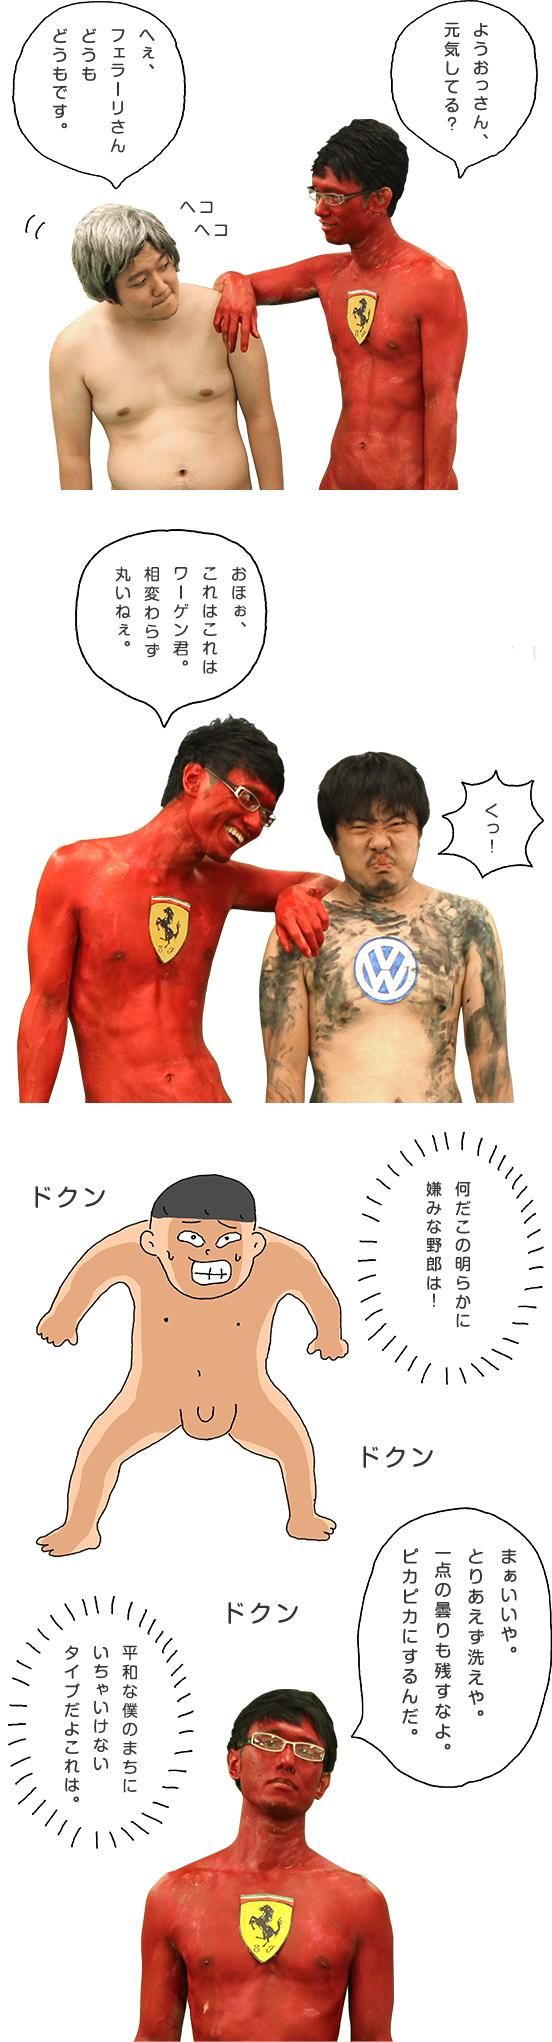 morioka_sensha_06.jpg